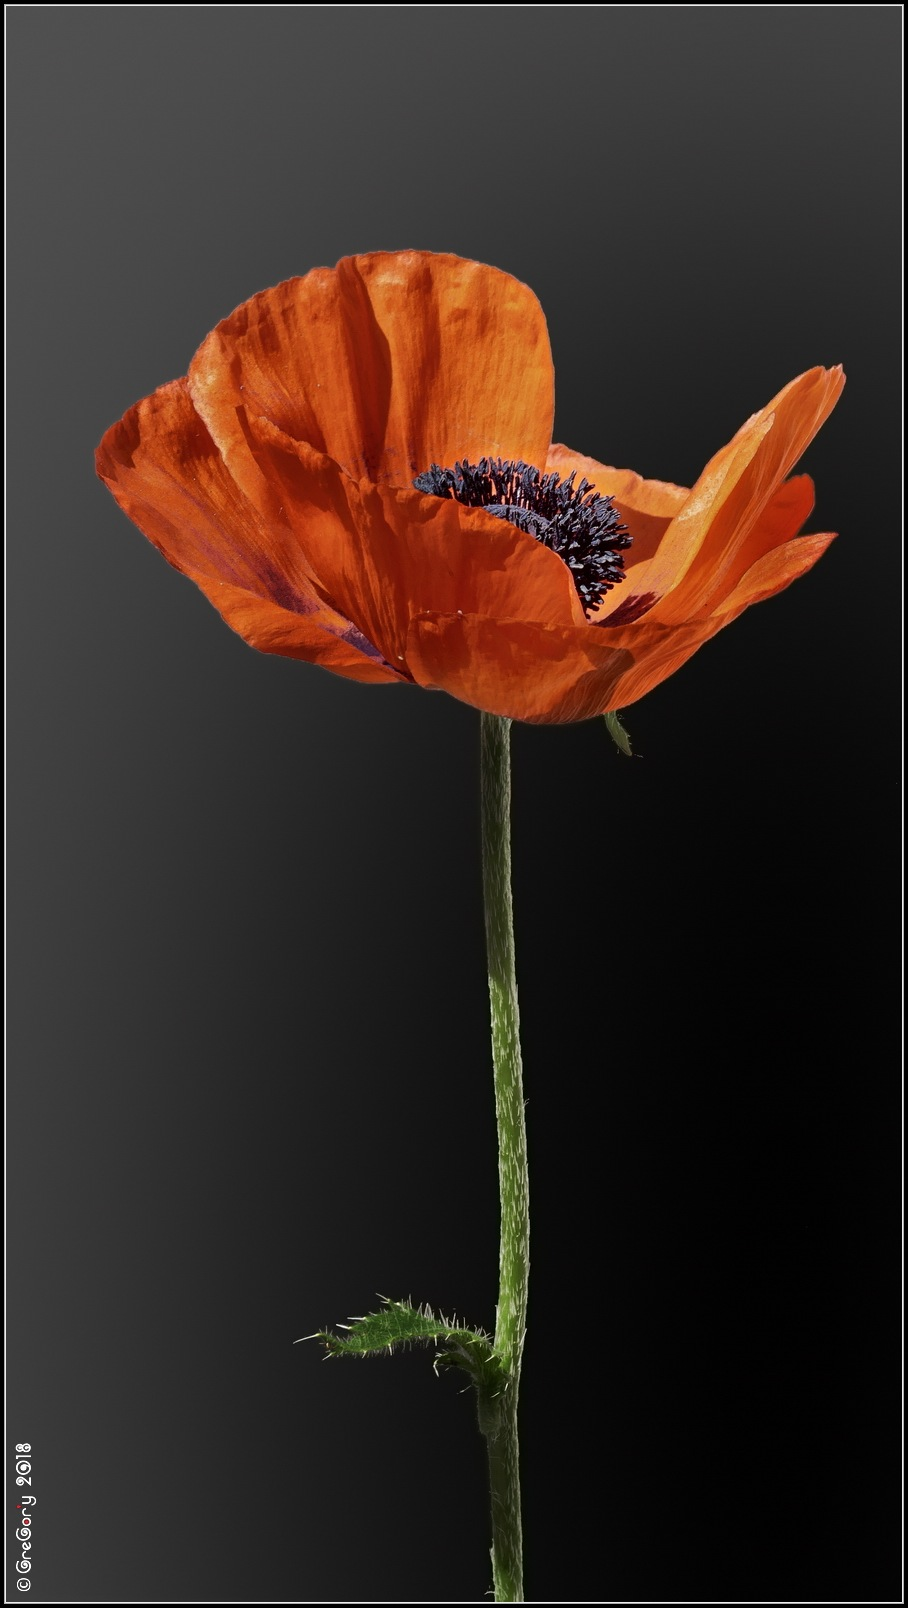 Мак / Poppy / Papaver by CreGory